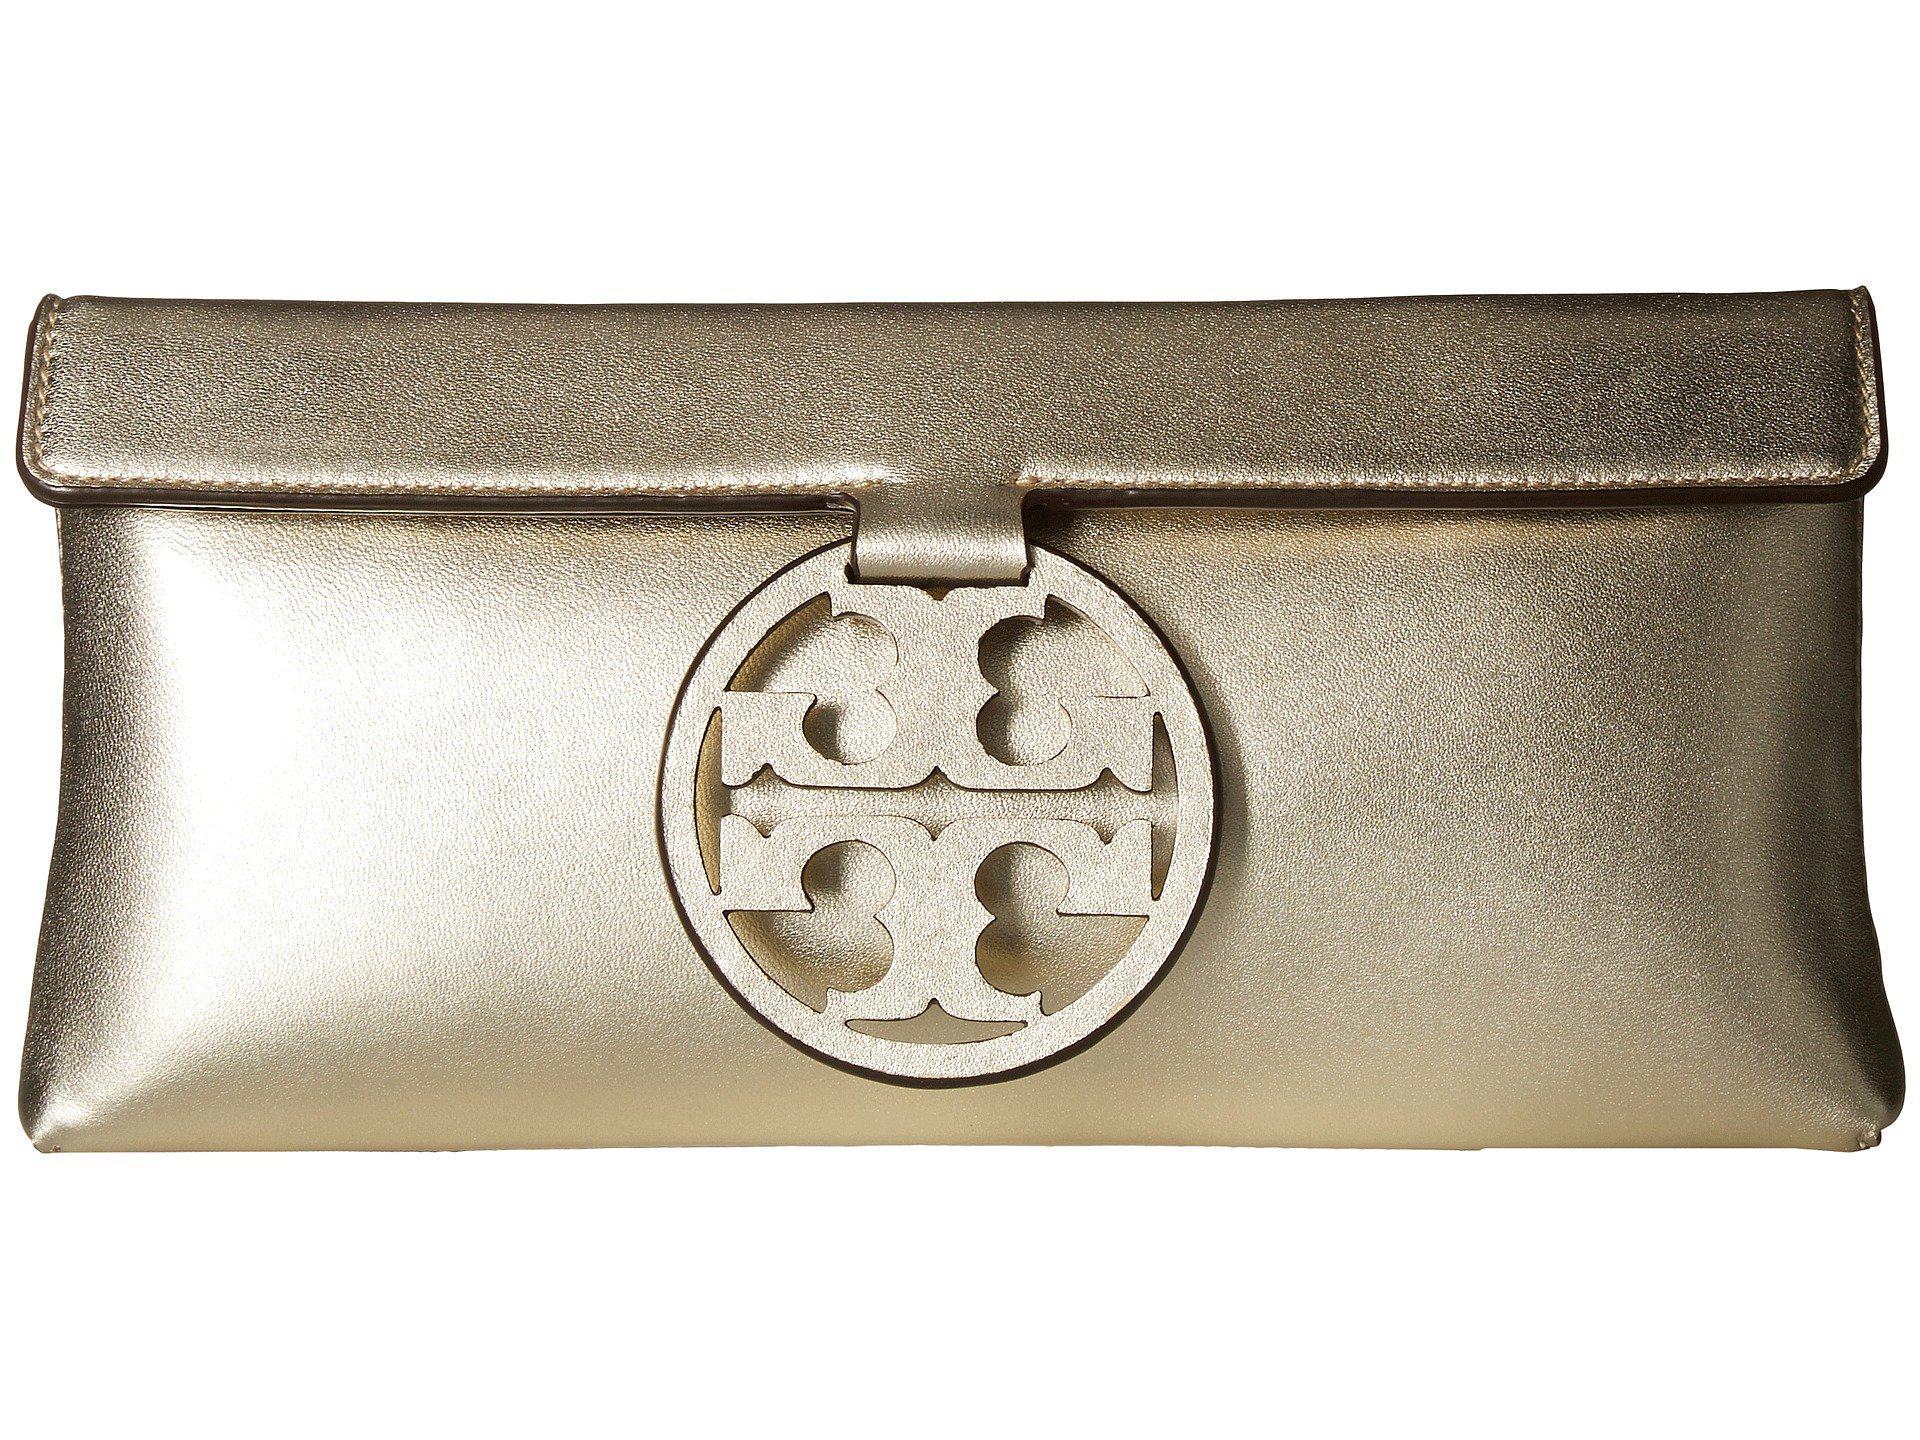 41ec9e5f301b Lyst - Tory Burch Miller Metallic Clutch (gold) Clutch Handbags in ...